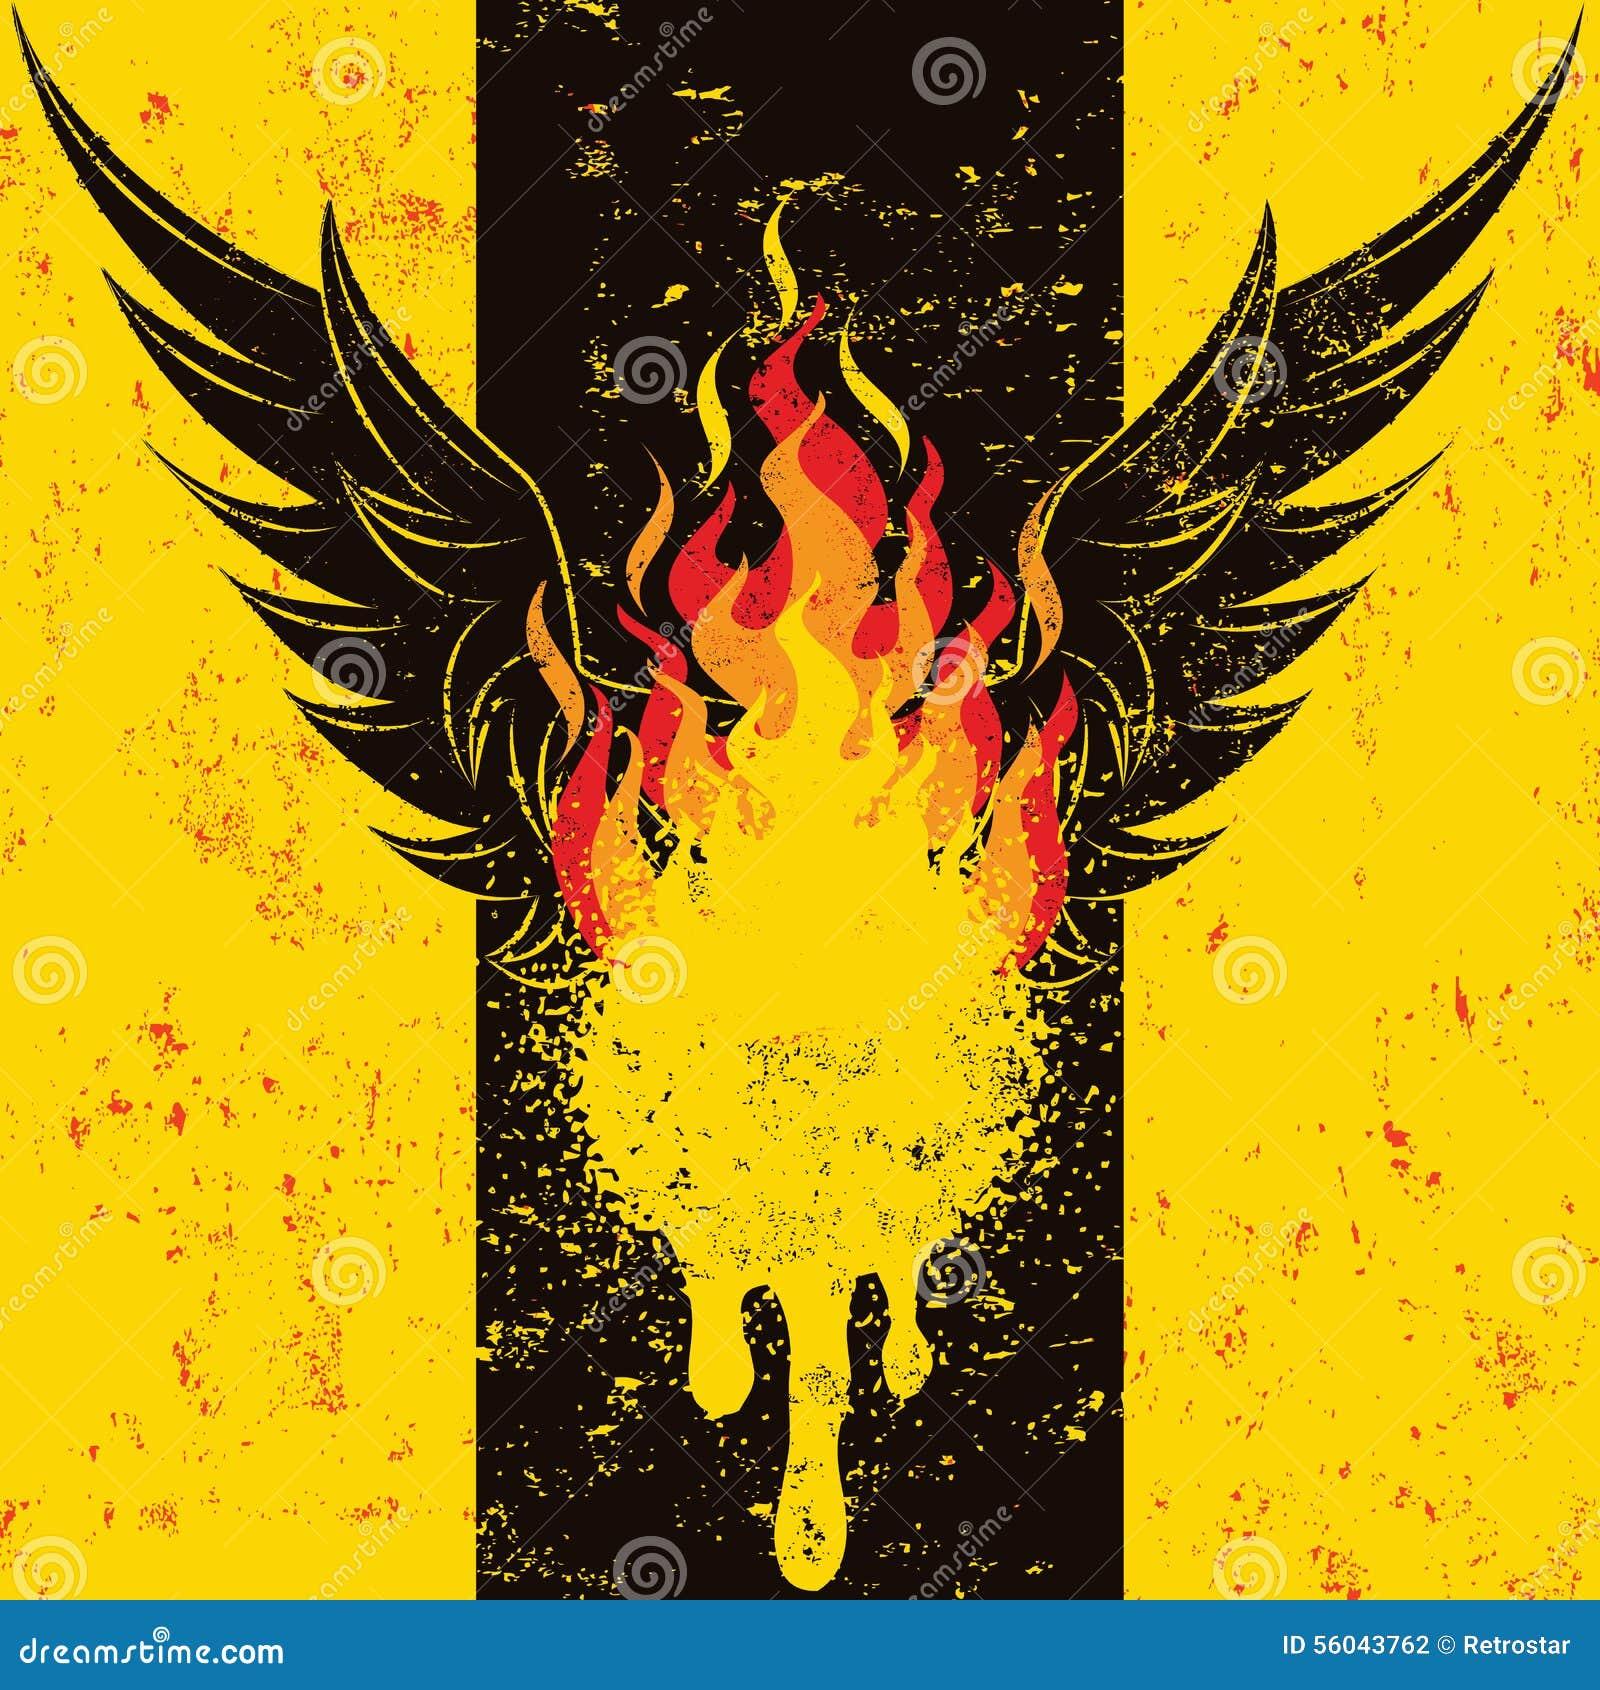 Vlammende vleugels